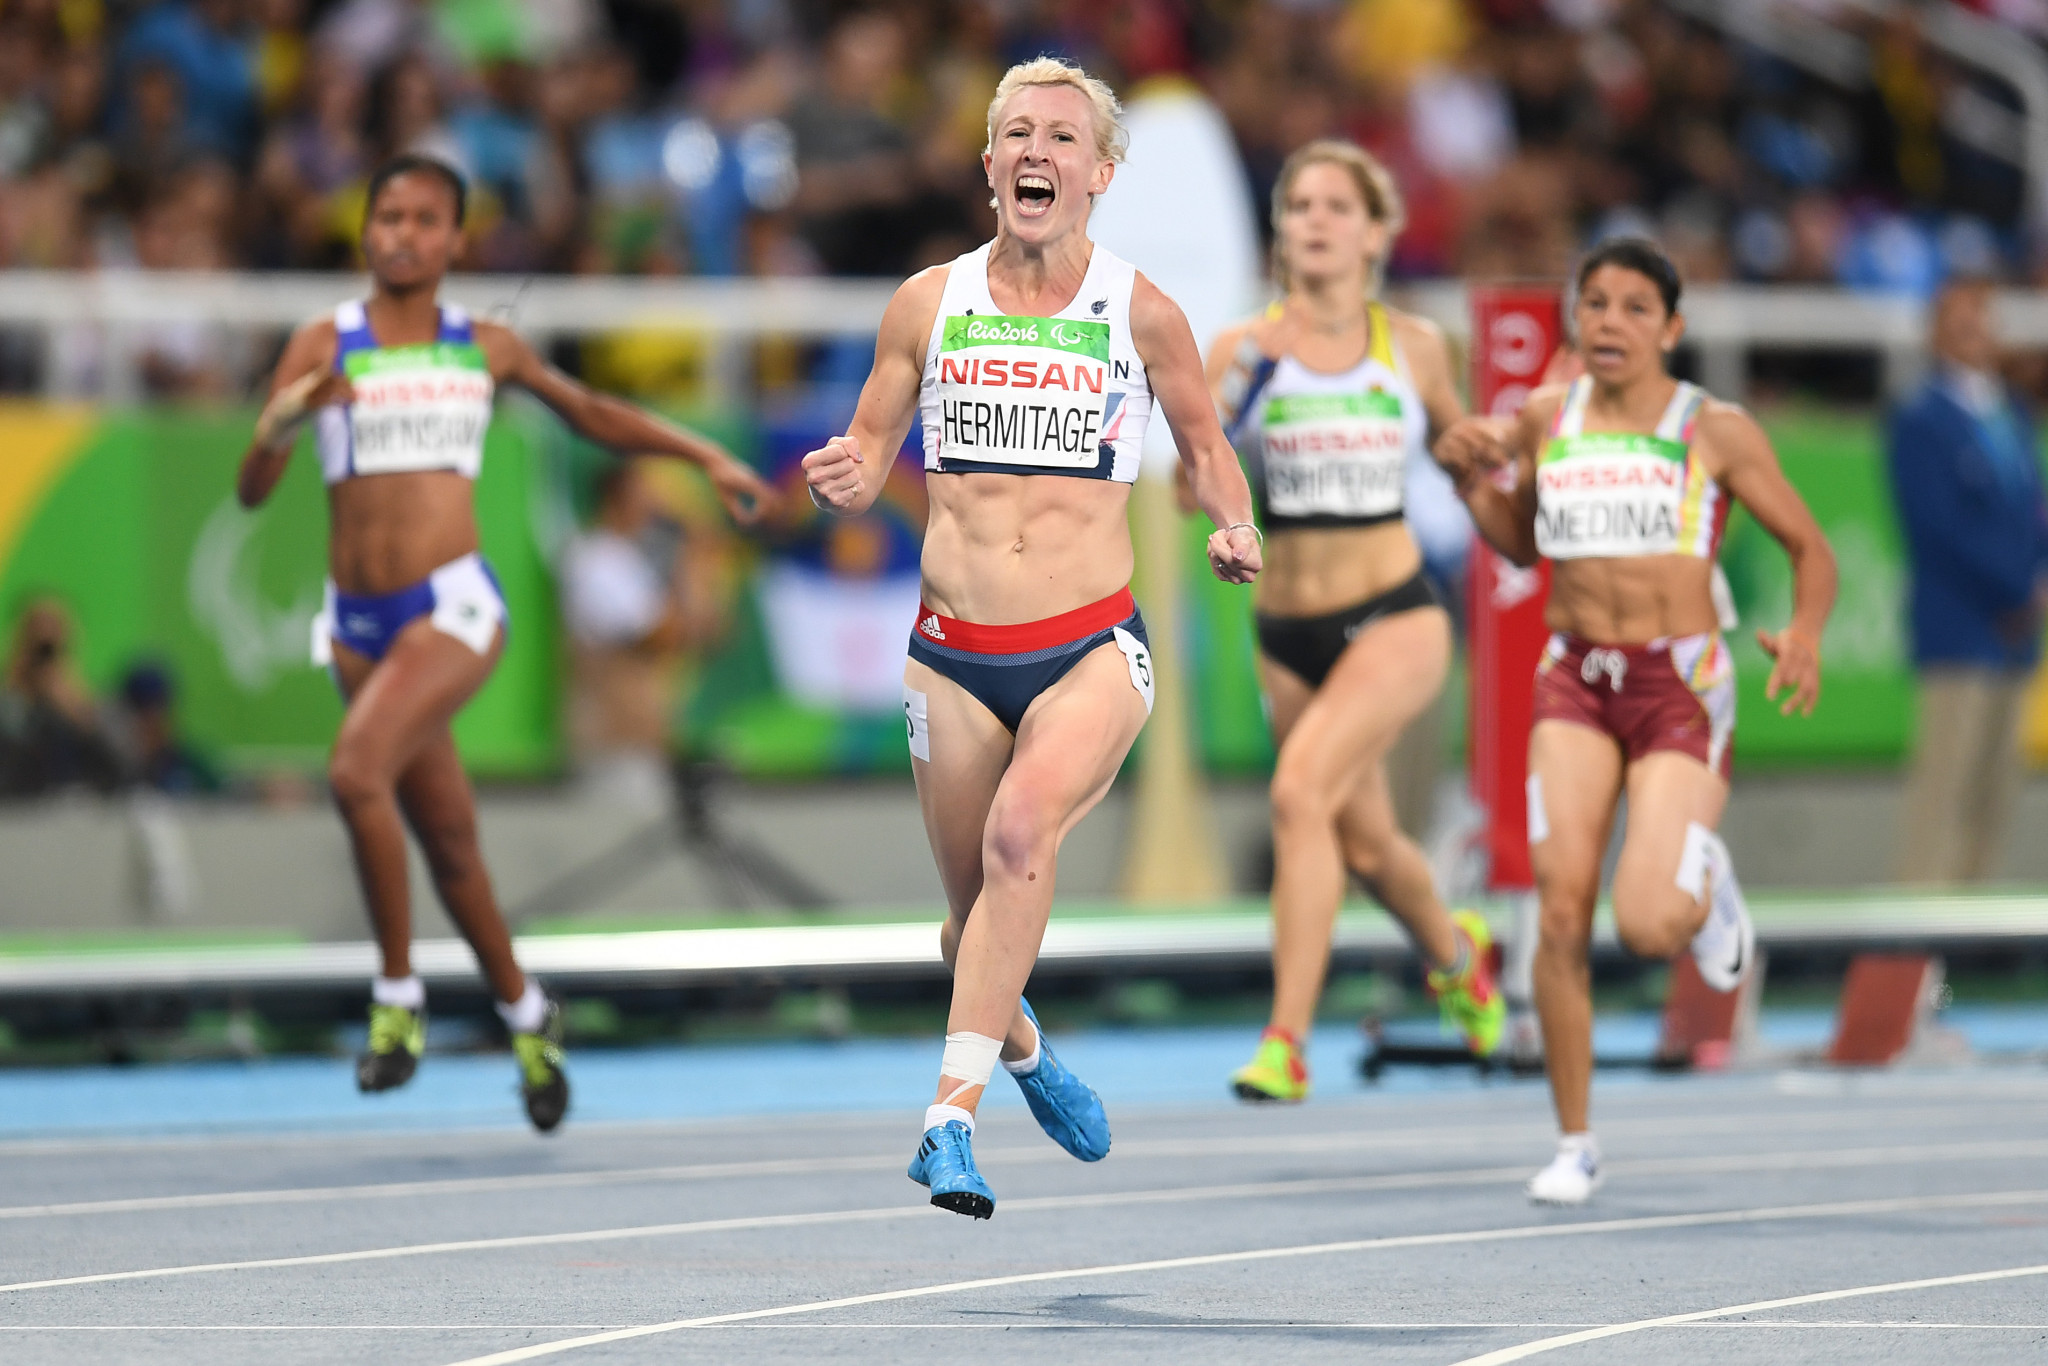 Double Paralympic champion Georgie Hermitage retires